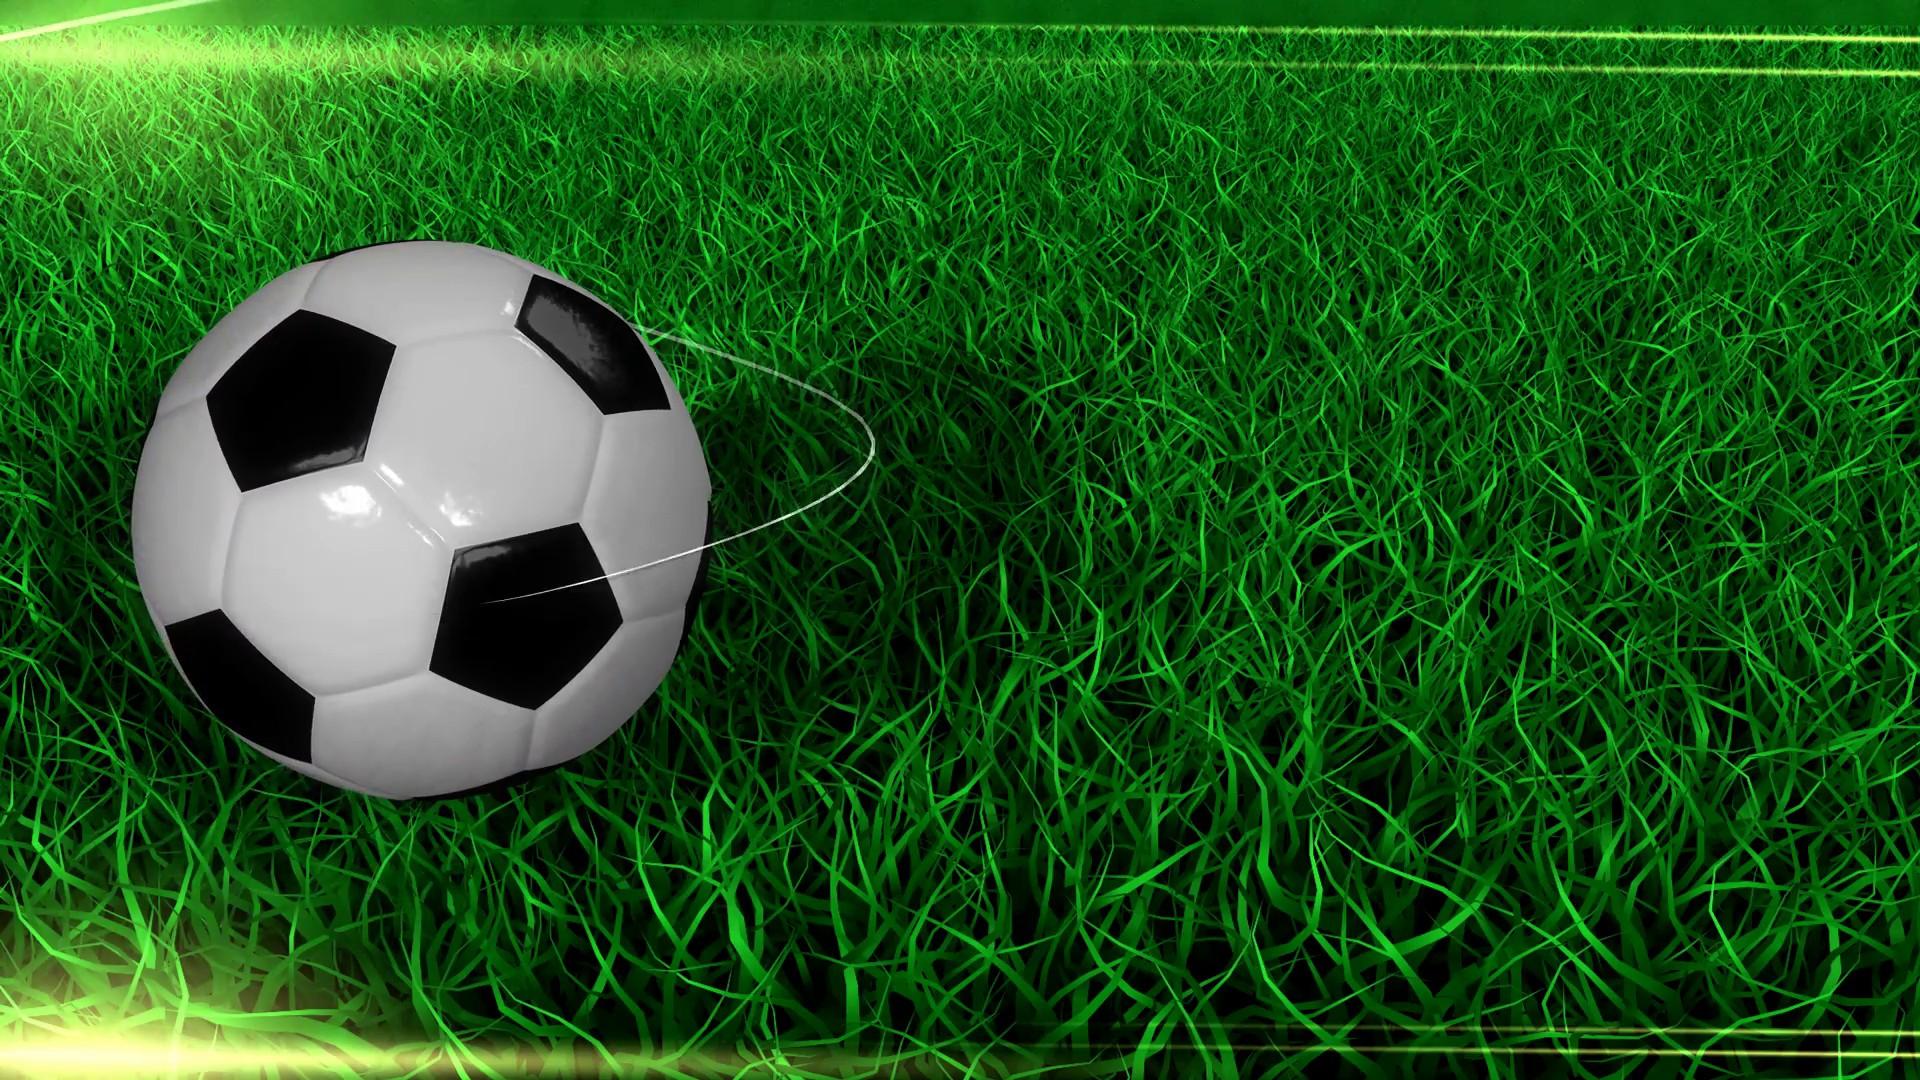 Soccer Field background \u00b7\u2460 Download free amazing full HD backgrounds for desktop, mobile, laptop